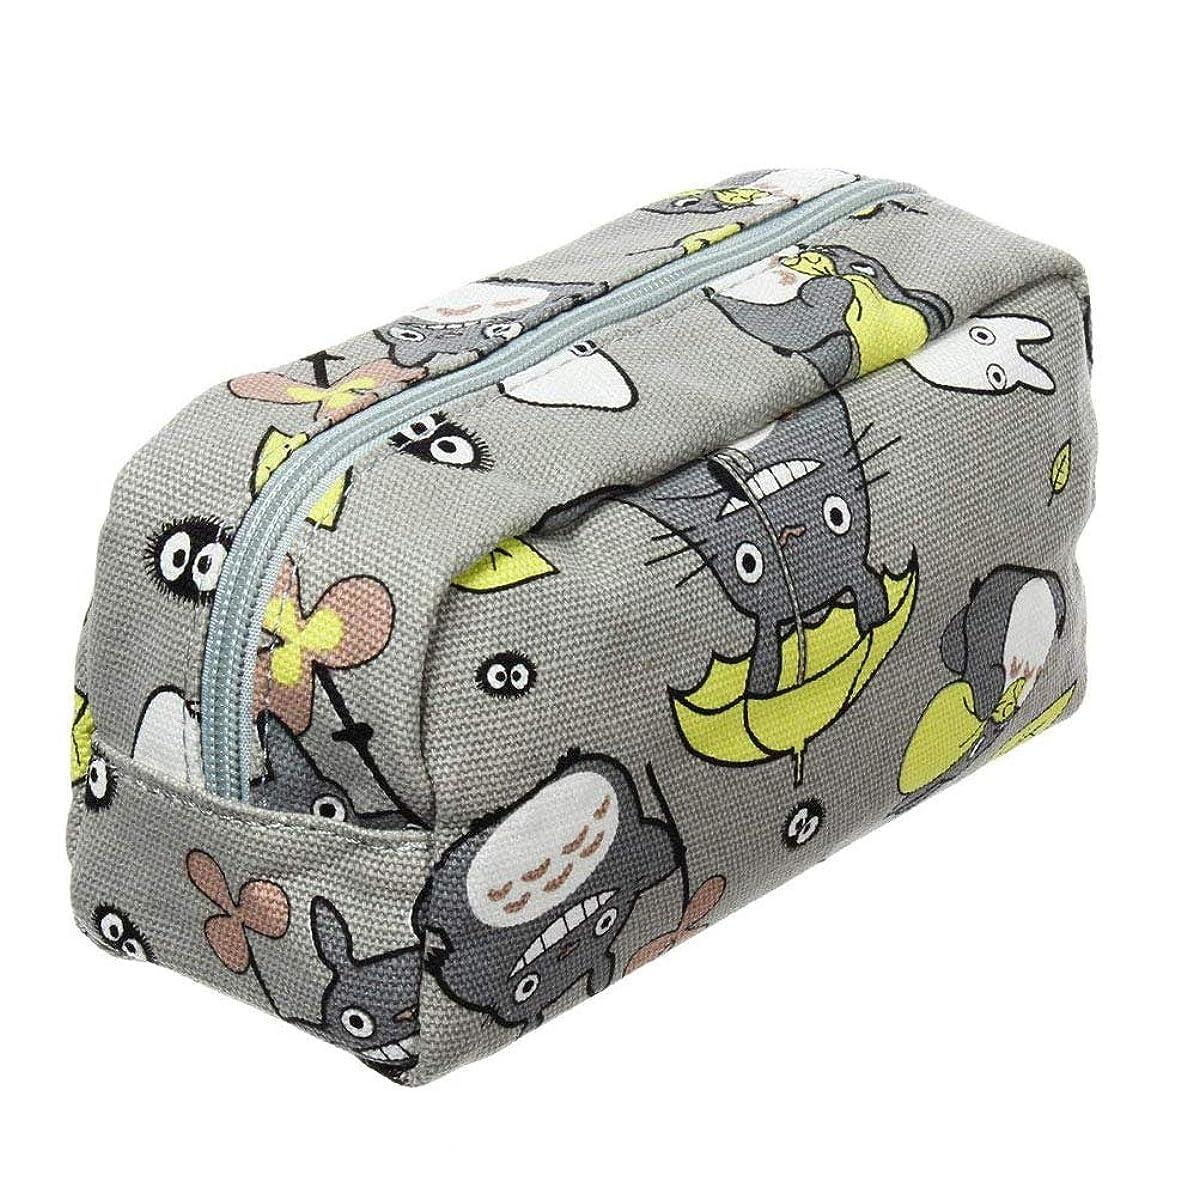 Errilol Cute Cartoon Style Zipper Pen Bag Pencil Case Cosmetic Makeup Bag Pouch Stationery Writing Office School Supplies Wallet Holder(Grey)